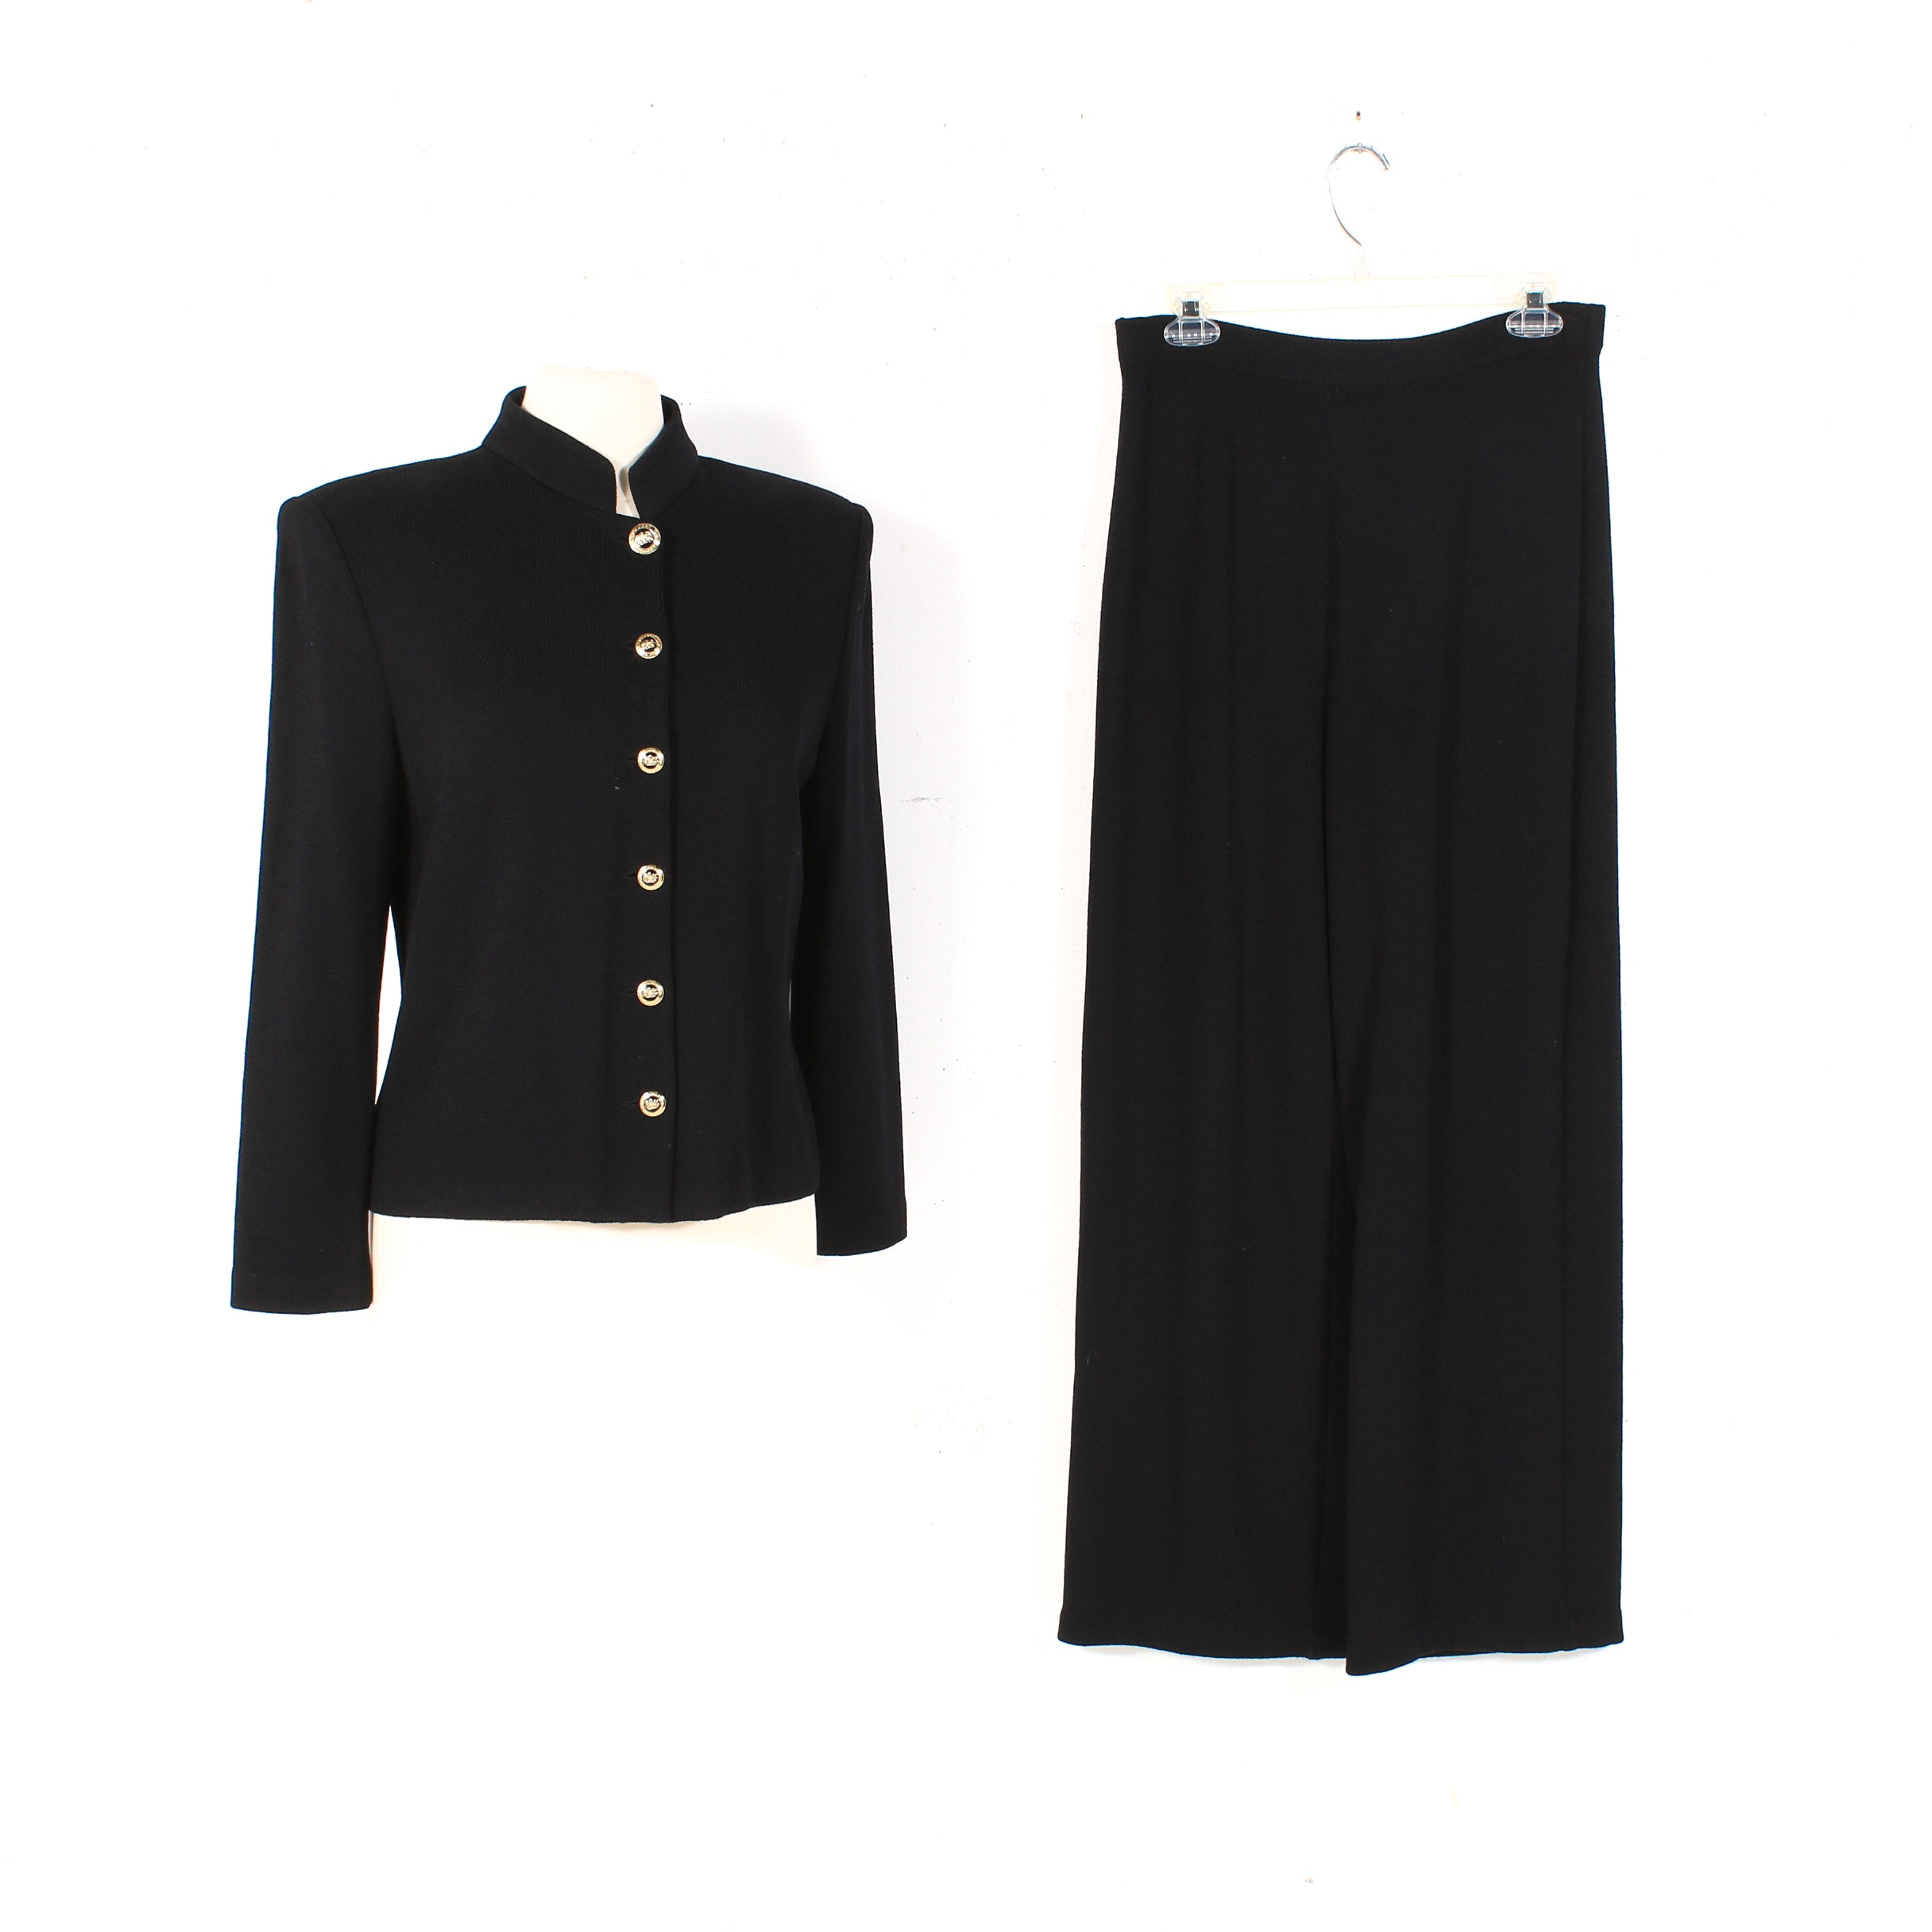 St. John Basics Knit Mandarin Collar Button-Front Jacket and Wide-Leg Pants